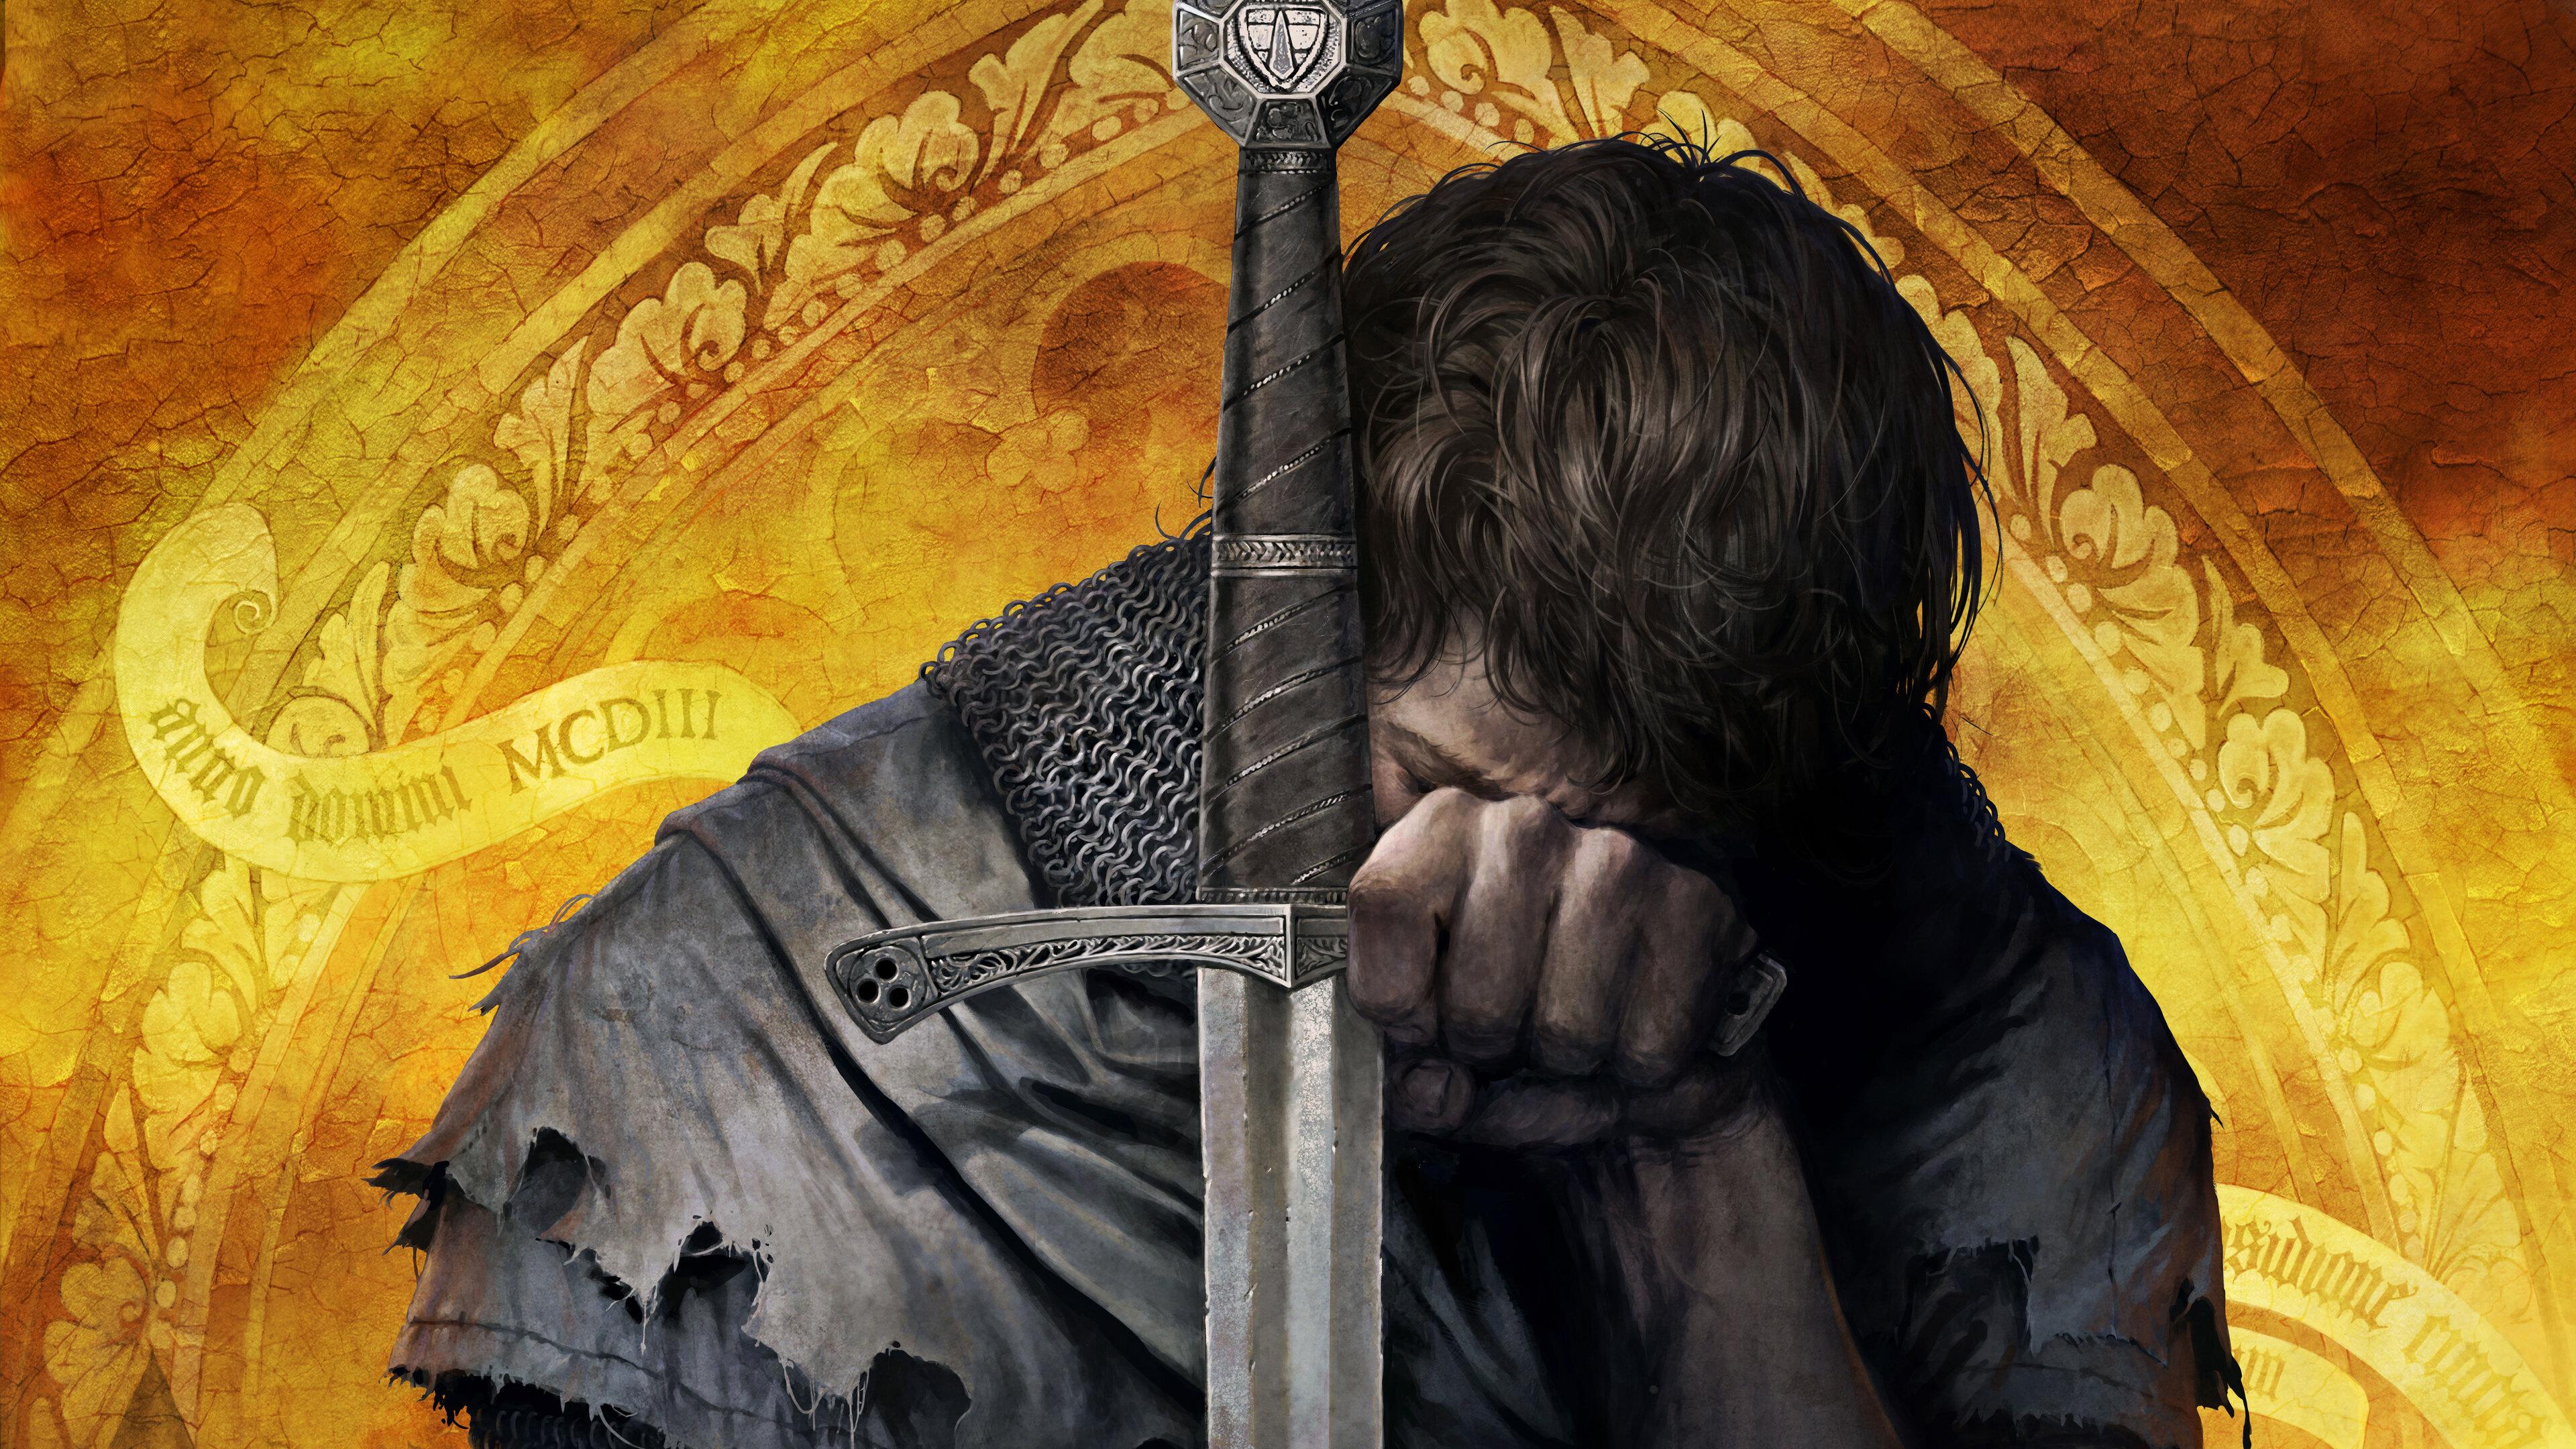 3840x2160 Kingdom Come Deliverance 8k 4k HD 4k Wallpapers ...